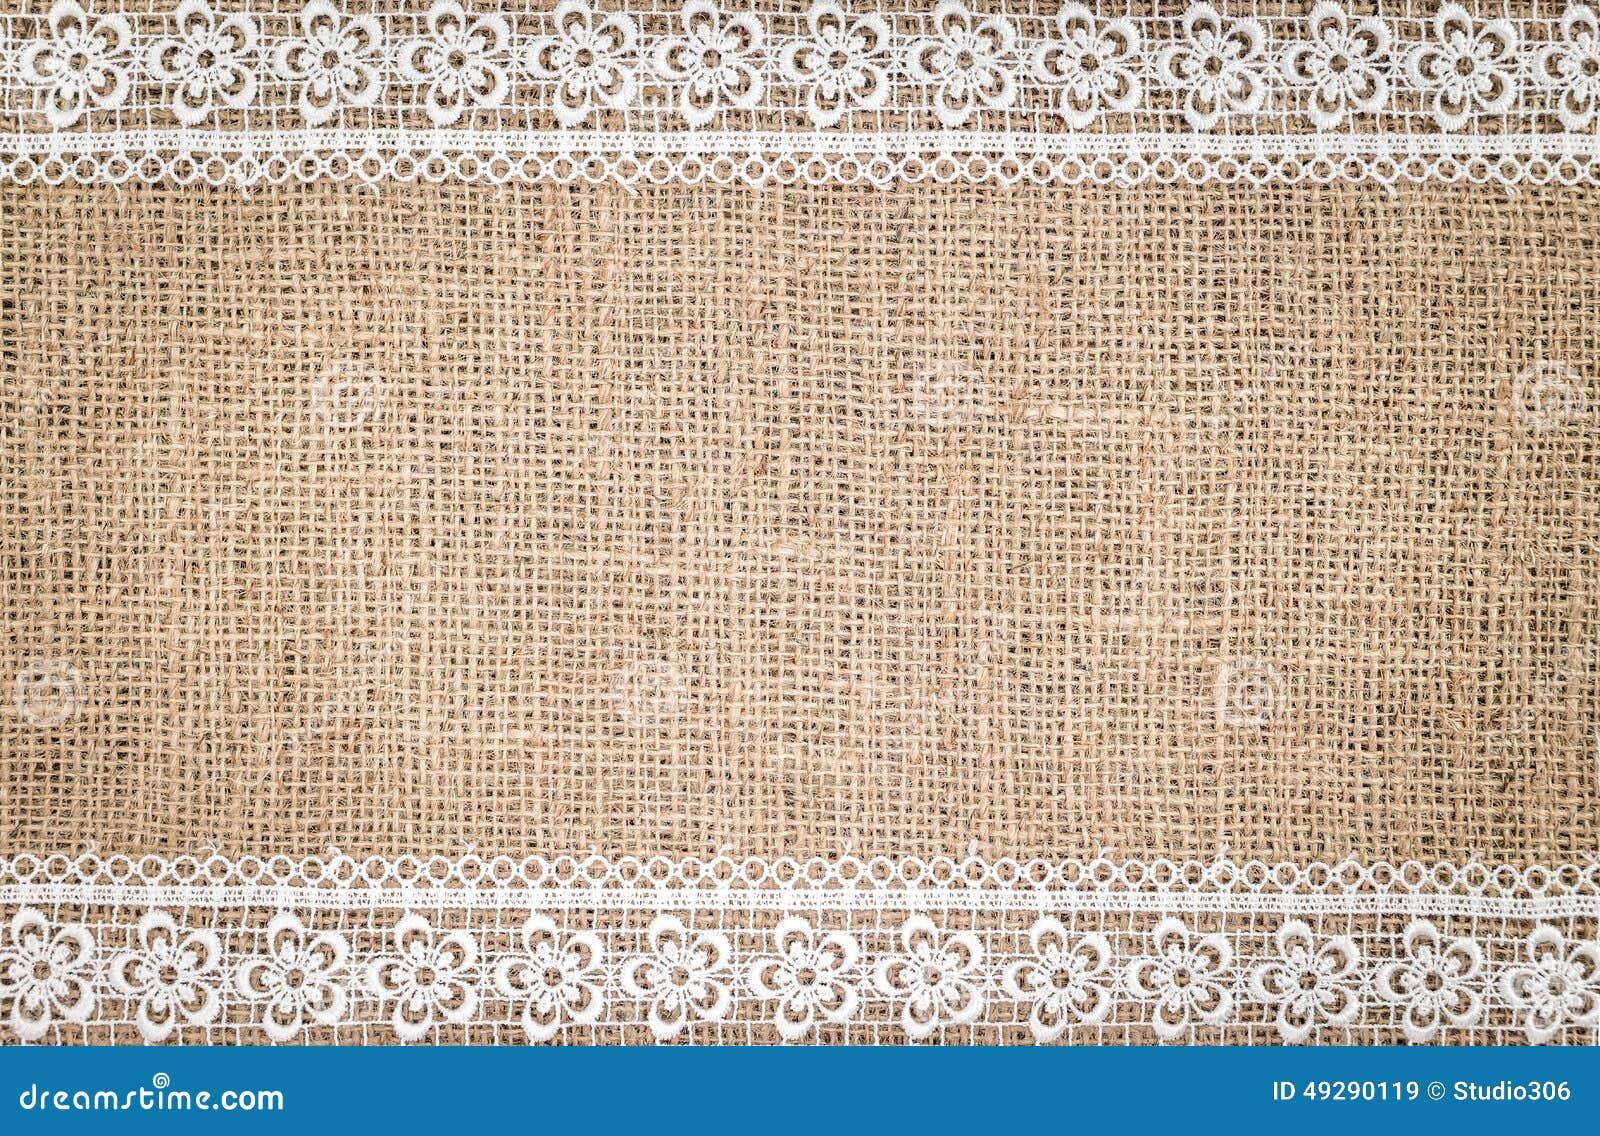 Burlap Texture Stock Photo - Image: 49290119